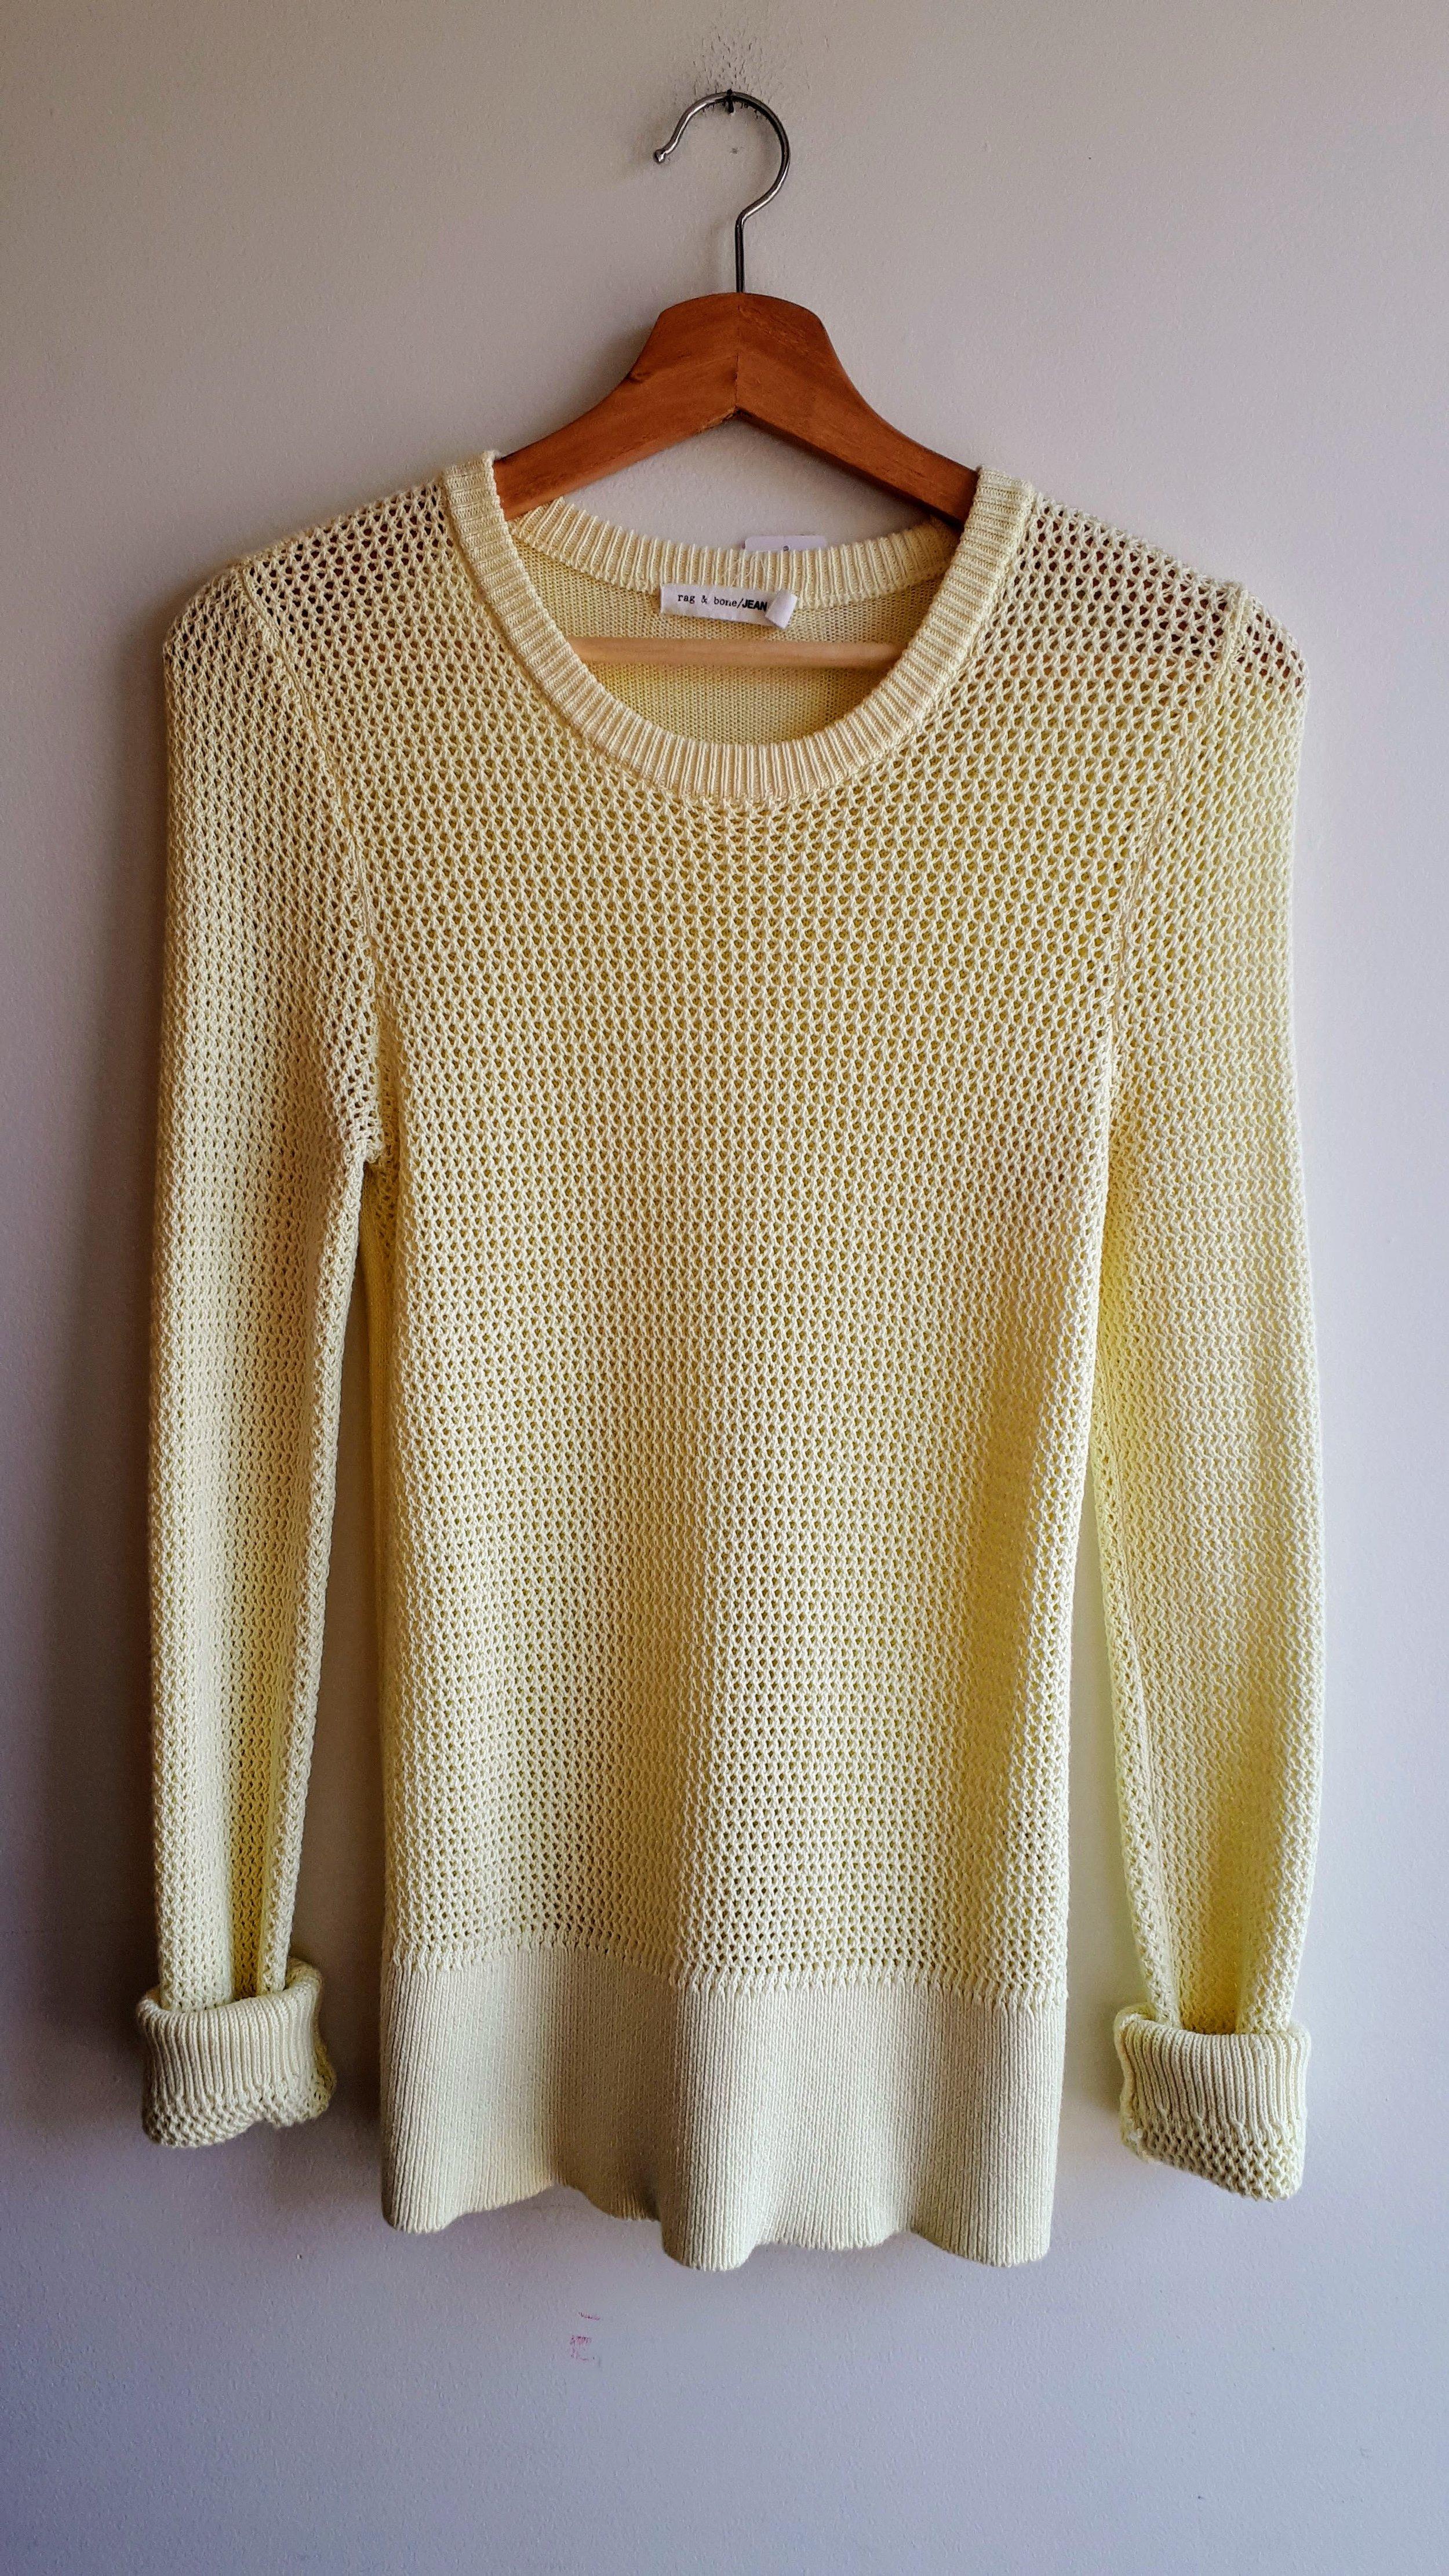 Rag & Bone sweater; Size S, $42